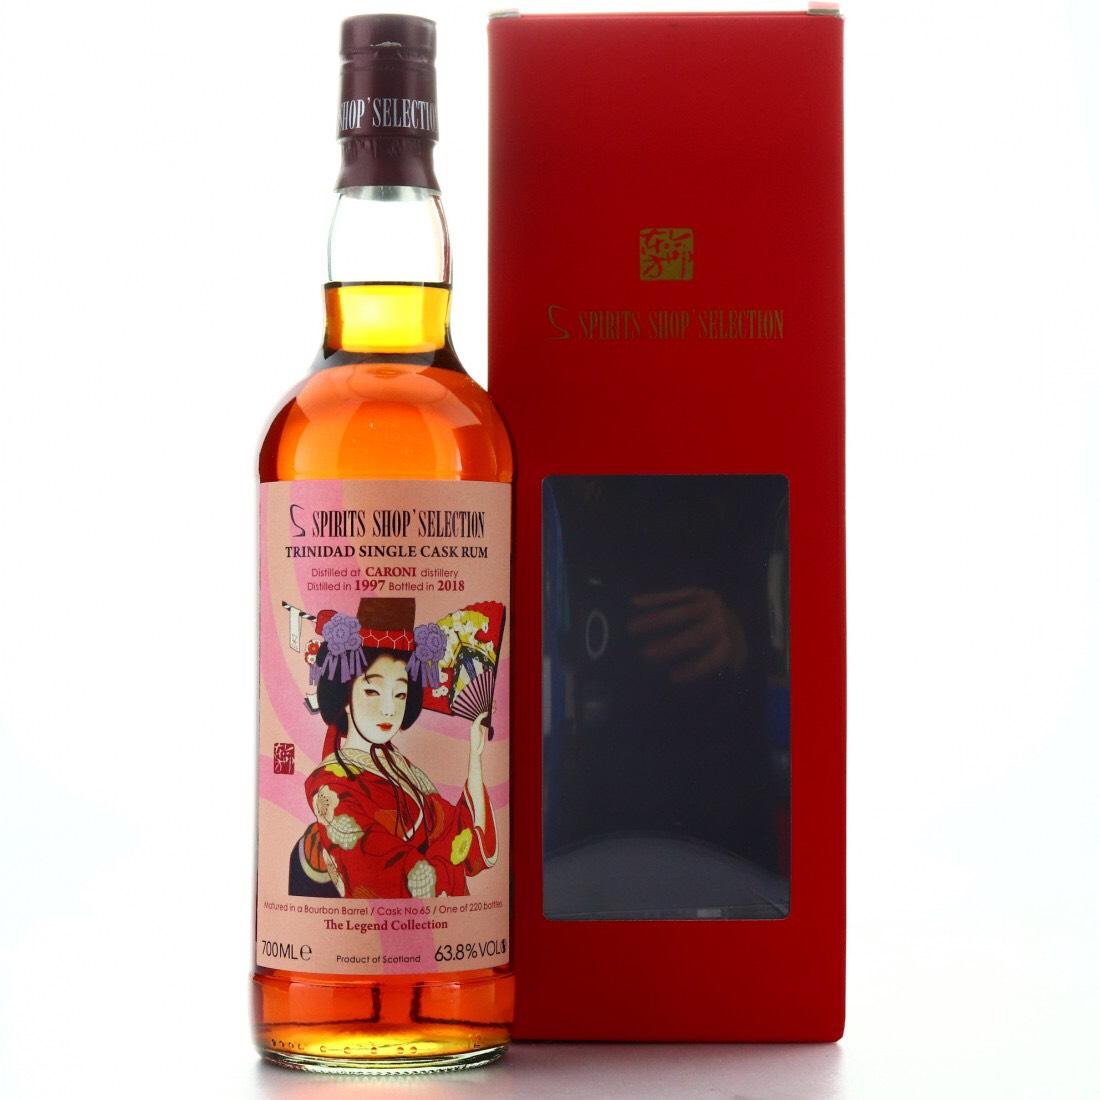 Bottle image of The Legend Collection HTR